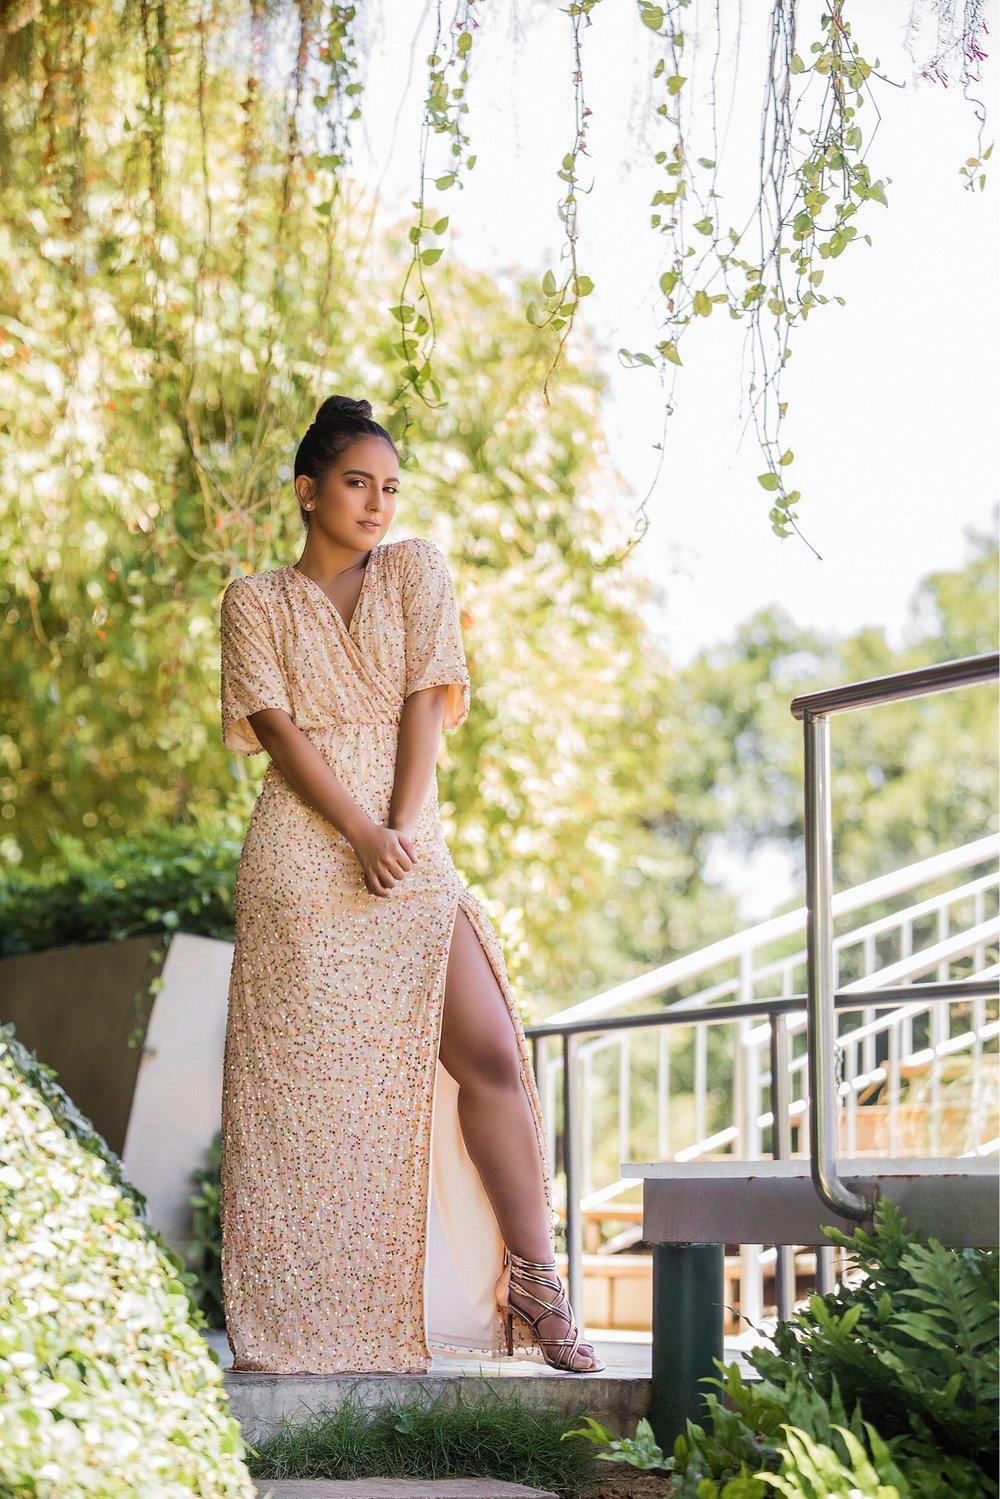 weddingready weddinlook ideas tips fashion blogger mountain wedding